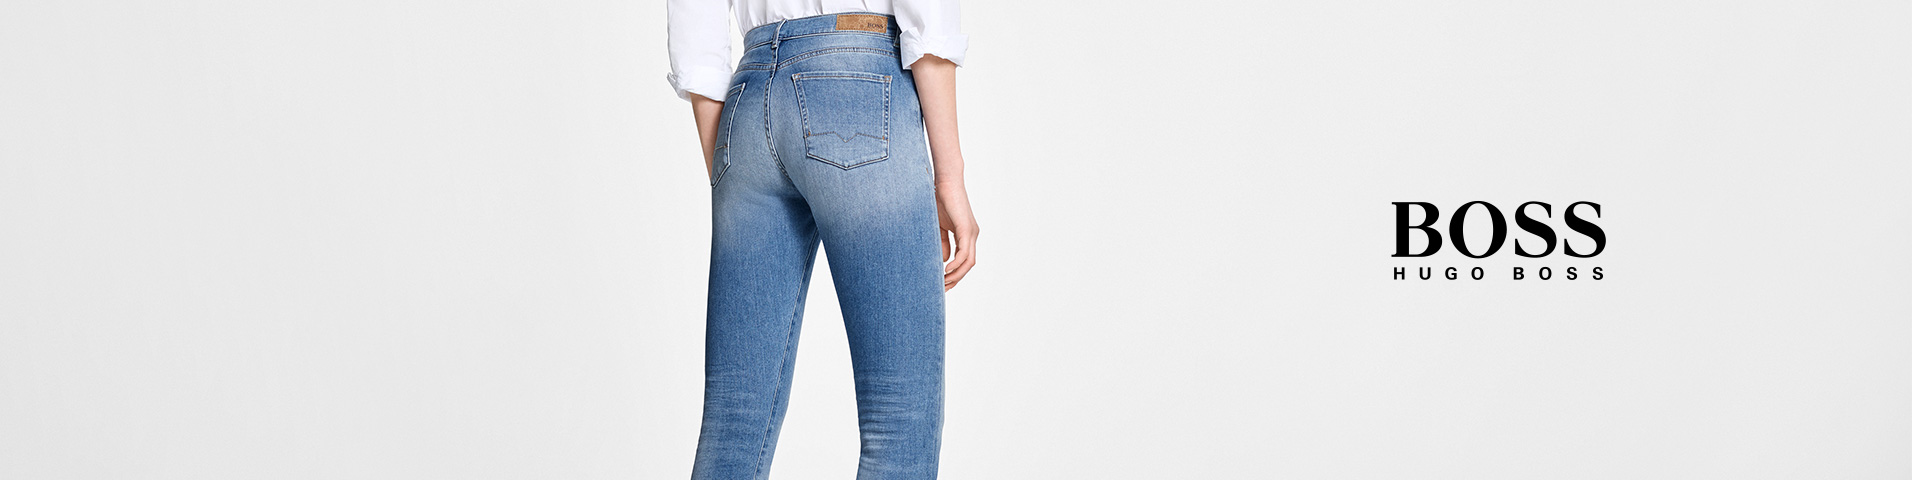 401ba5145b3 BOSS Slim fit-jeans | Dam | Köp jeans i slim fit online på Zalando.se